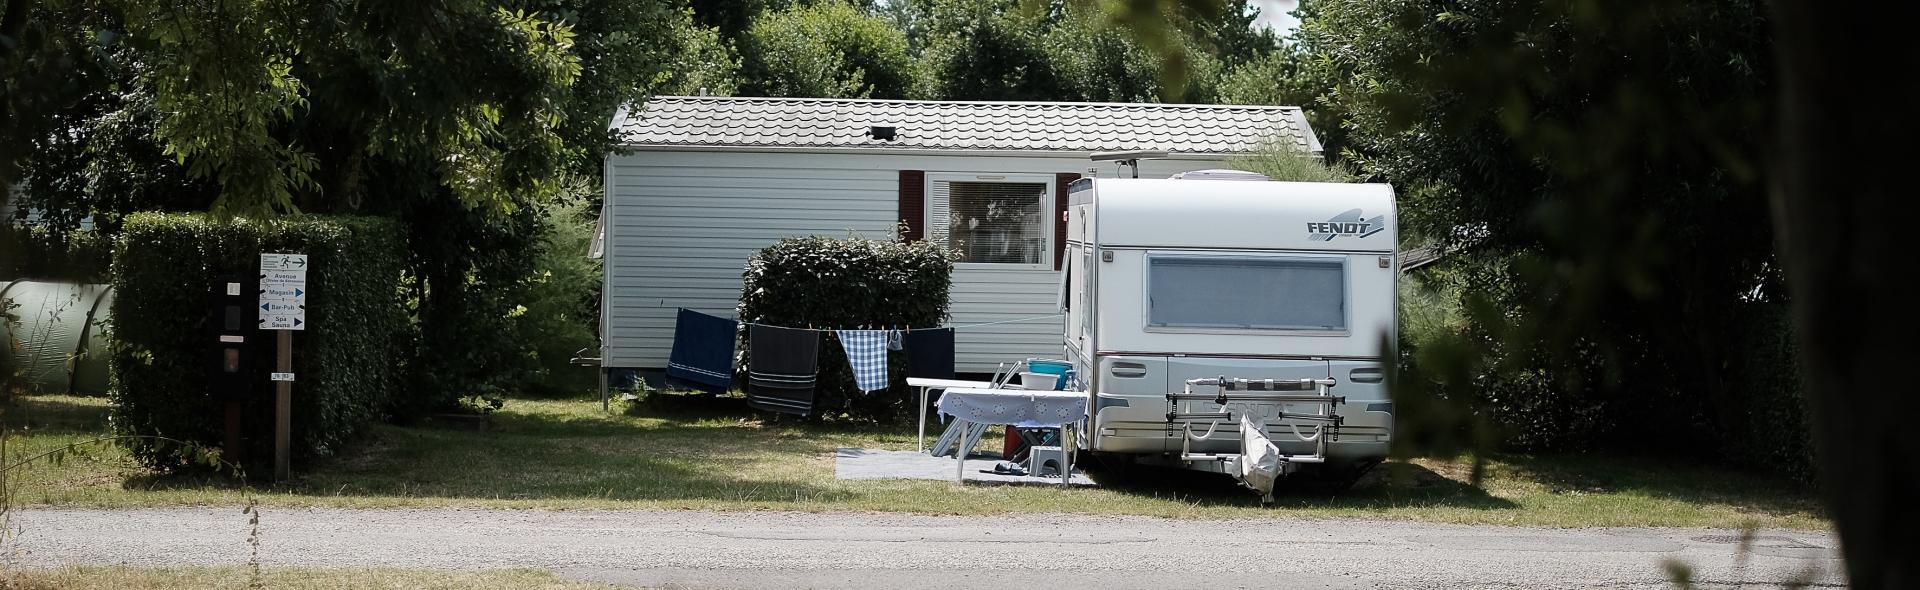 camping avec piscine nord